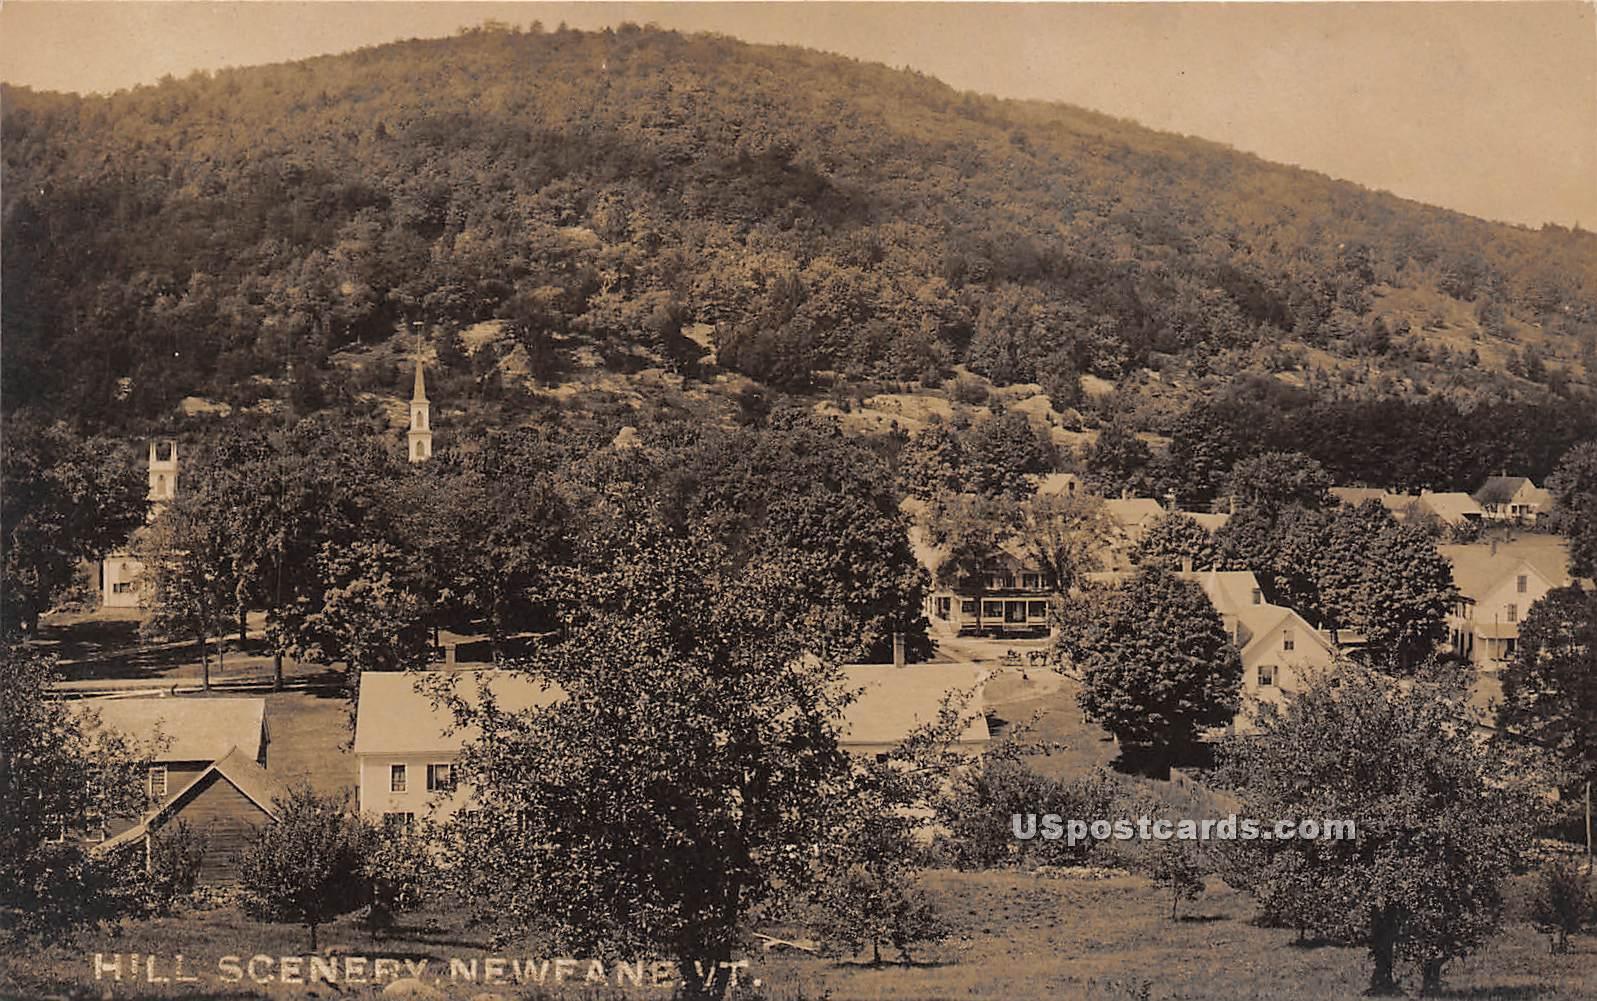 Hill Scenery - Newfane, Vermont VT Postcard